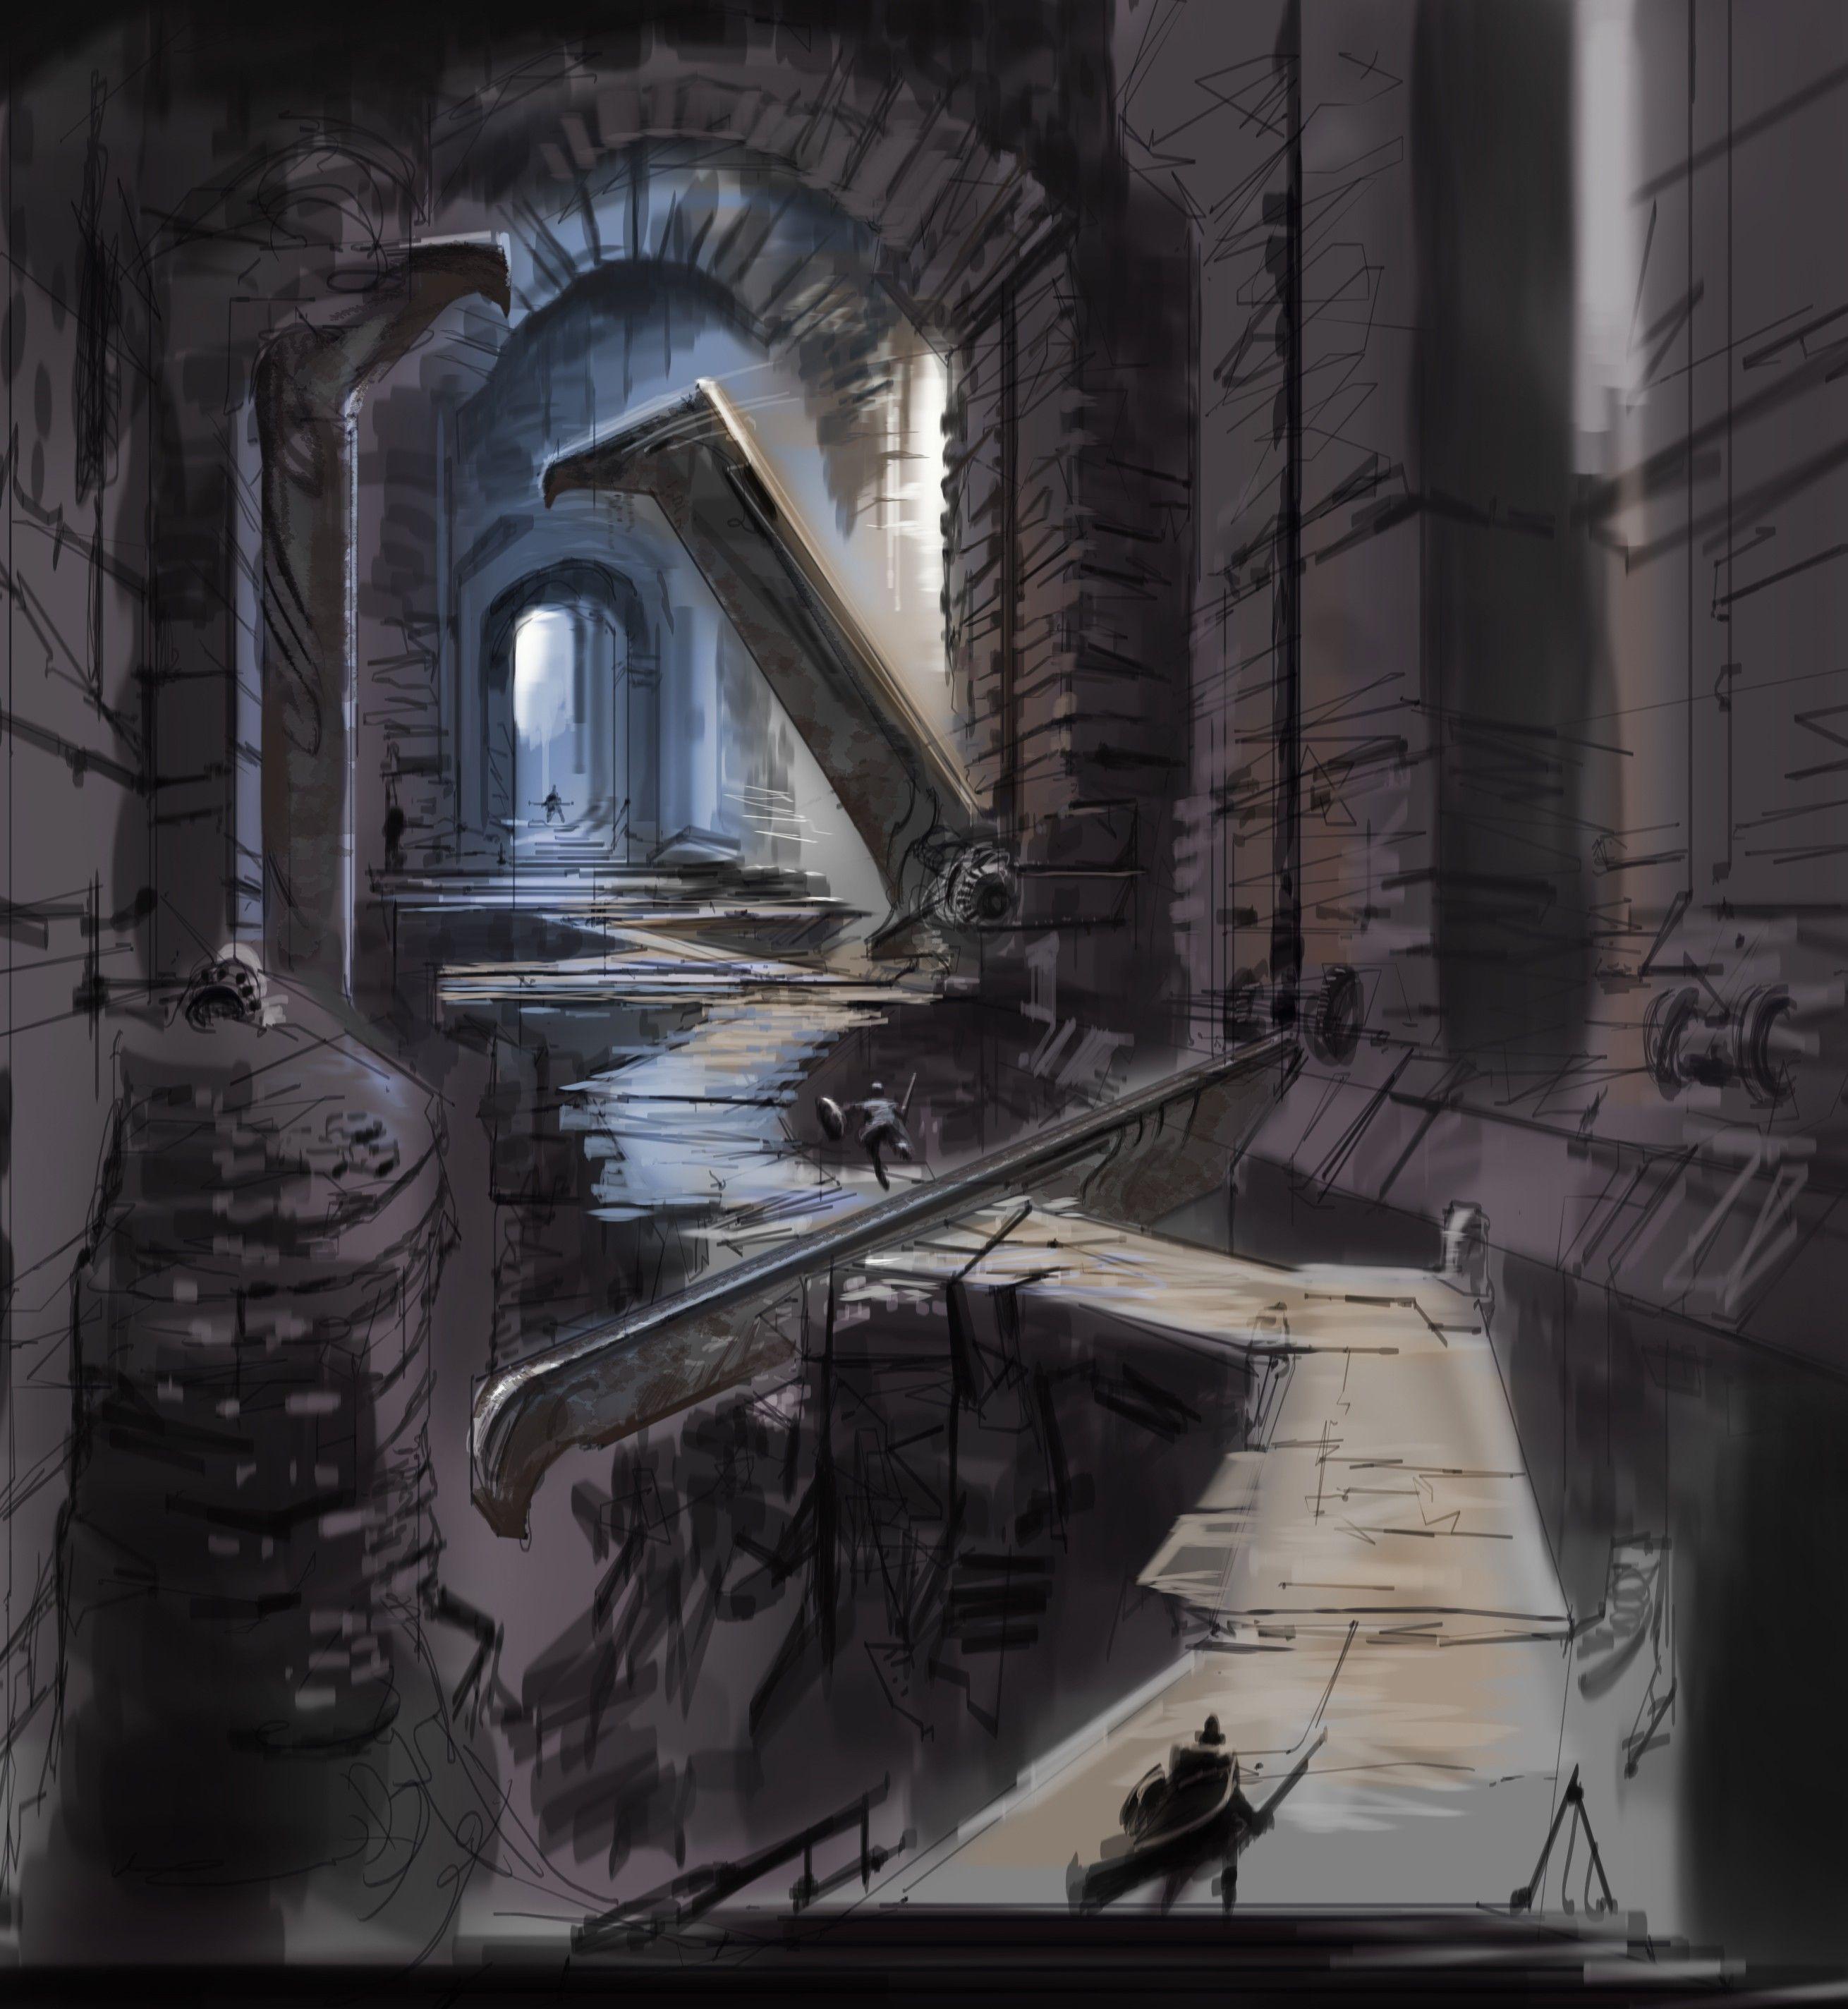 Cleaver Hallway Video Games Artwork Ловушки